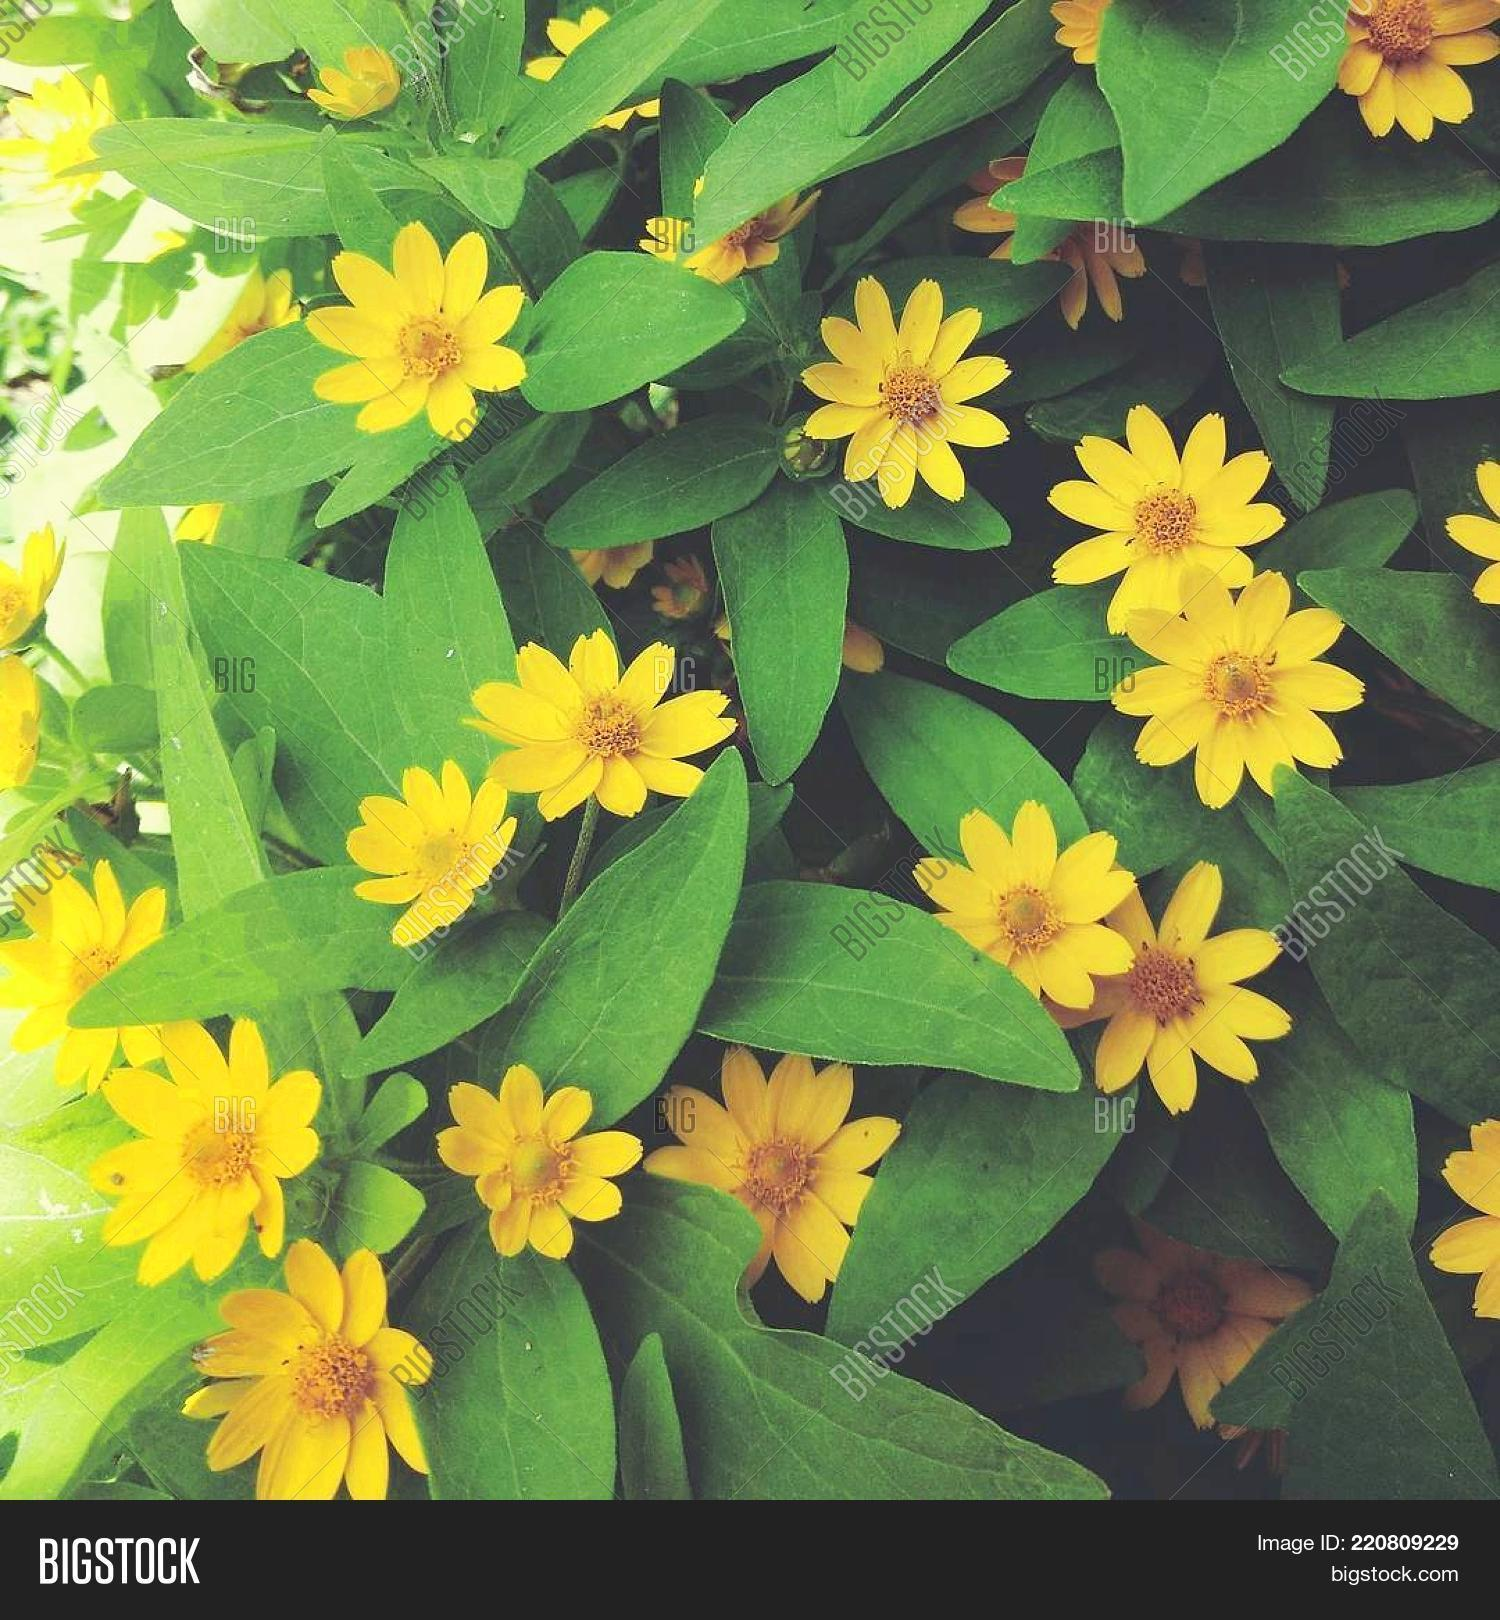 Name daisy takes name image photo free trial bigstock the name daisy takes its name from the sun yellow daisy meaning days izmirmasajfo